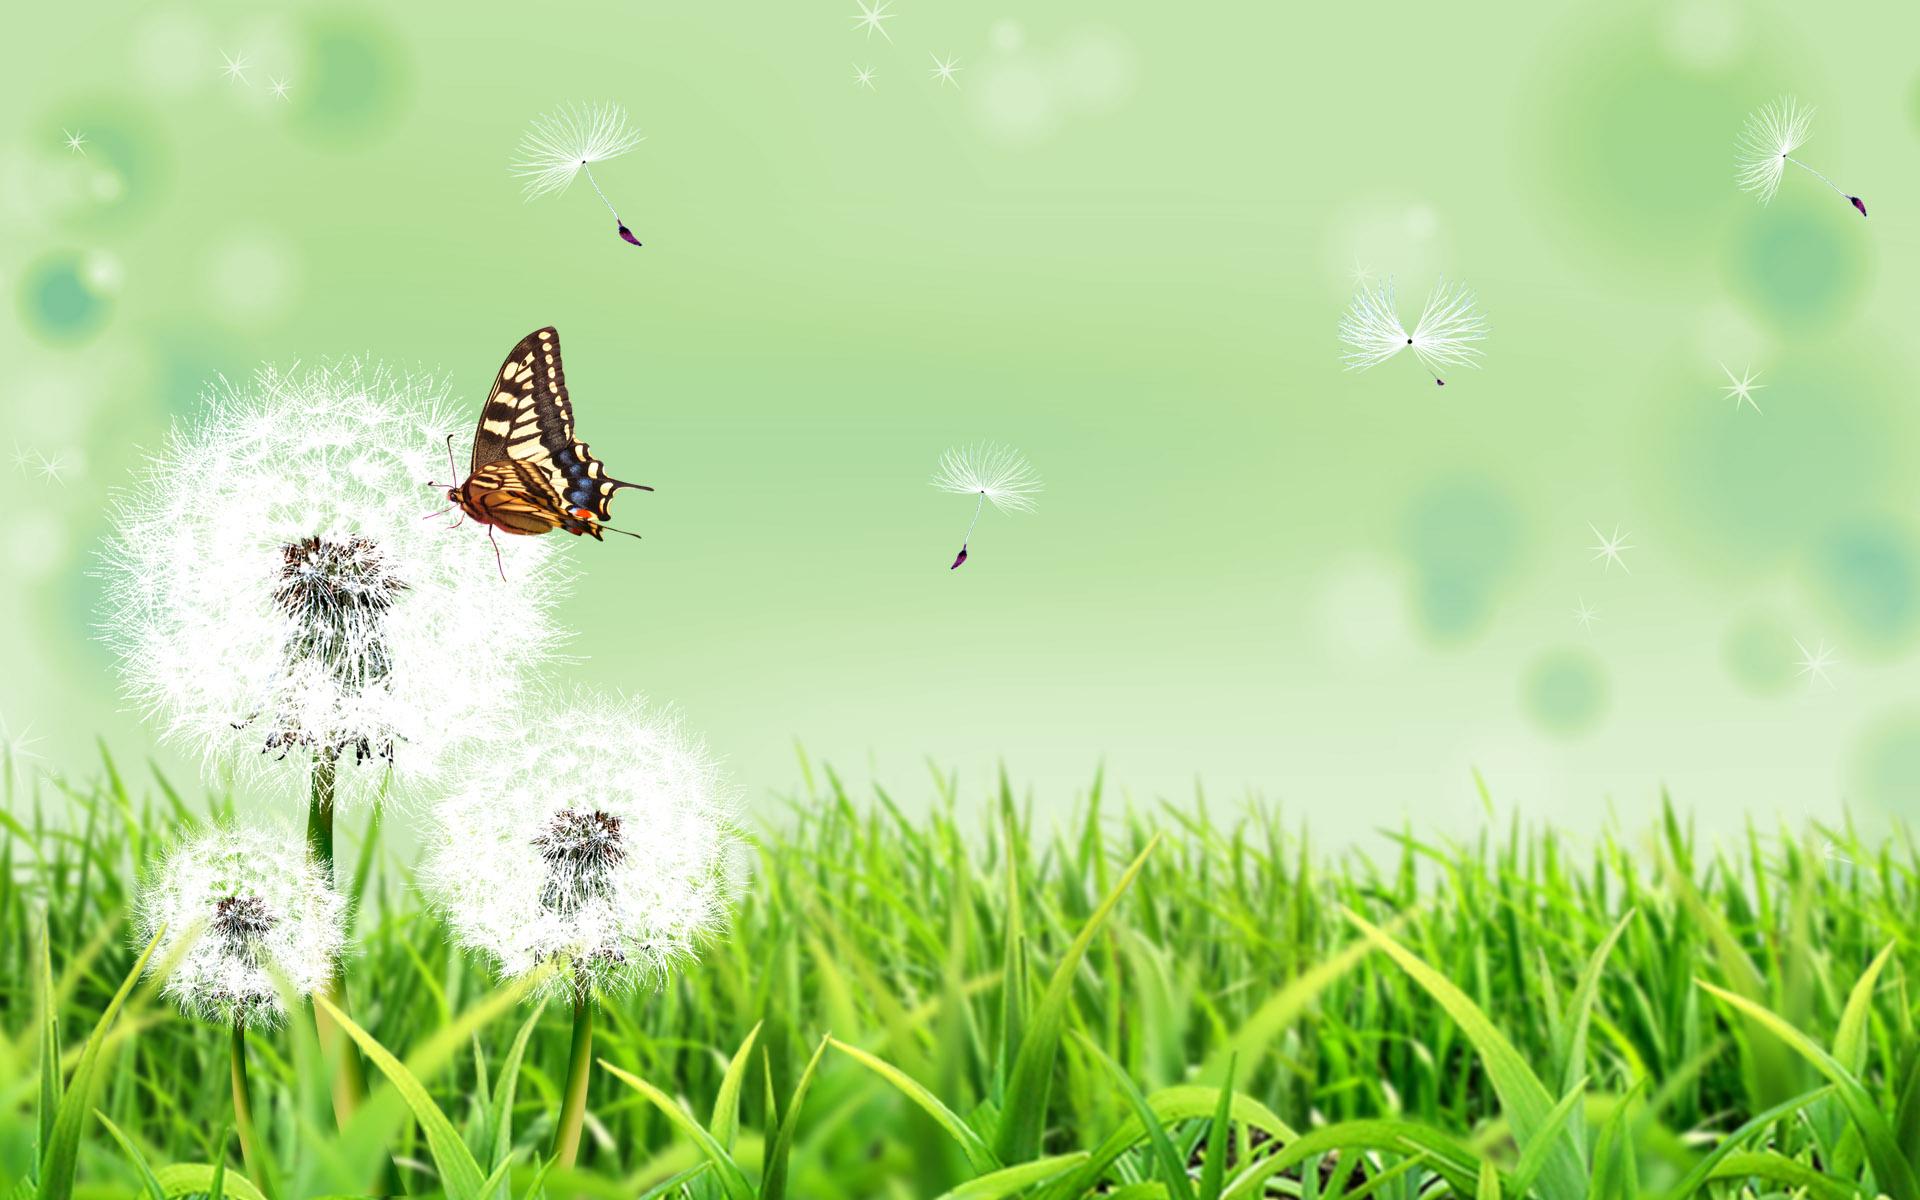 трава, одуванчики, скачать фото, бабочка, лето